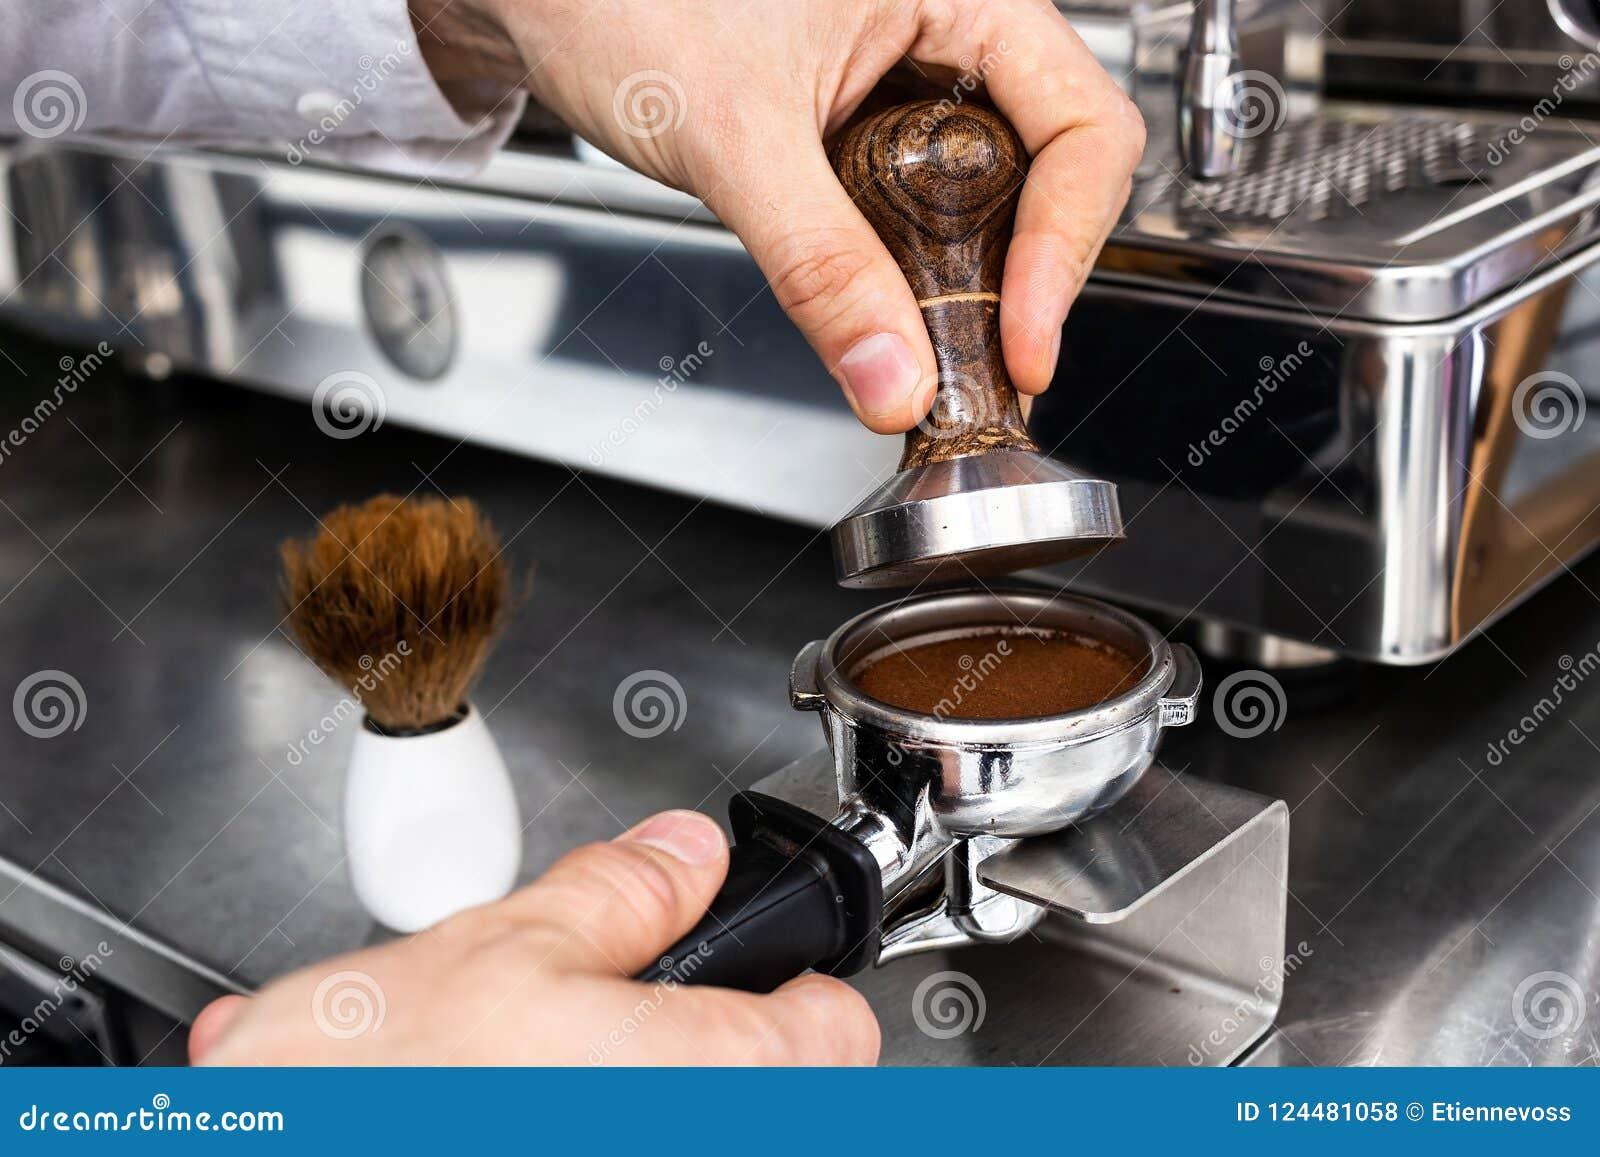 Barista que presiona el café molido en portafilter con un pisón